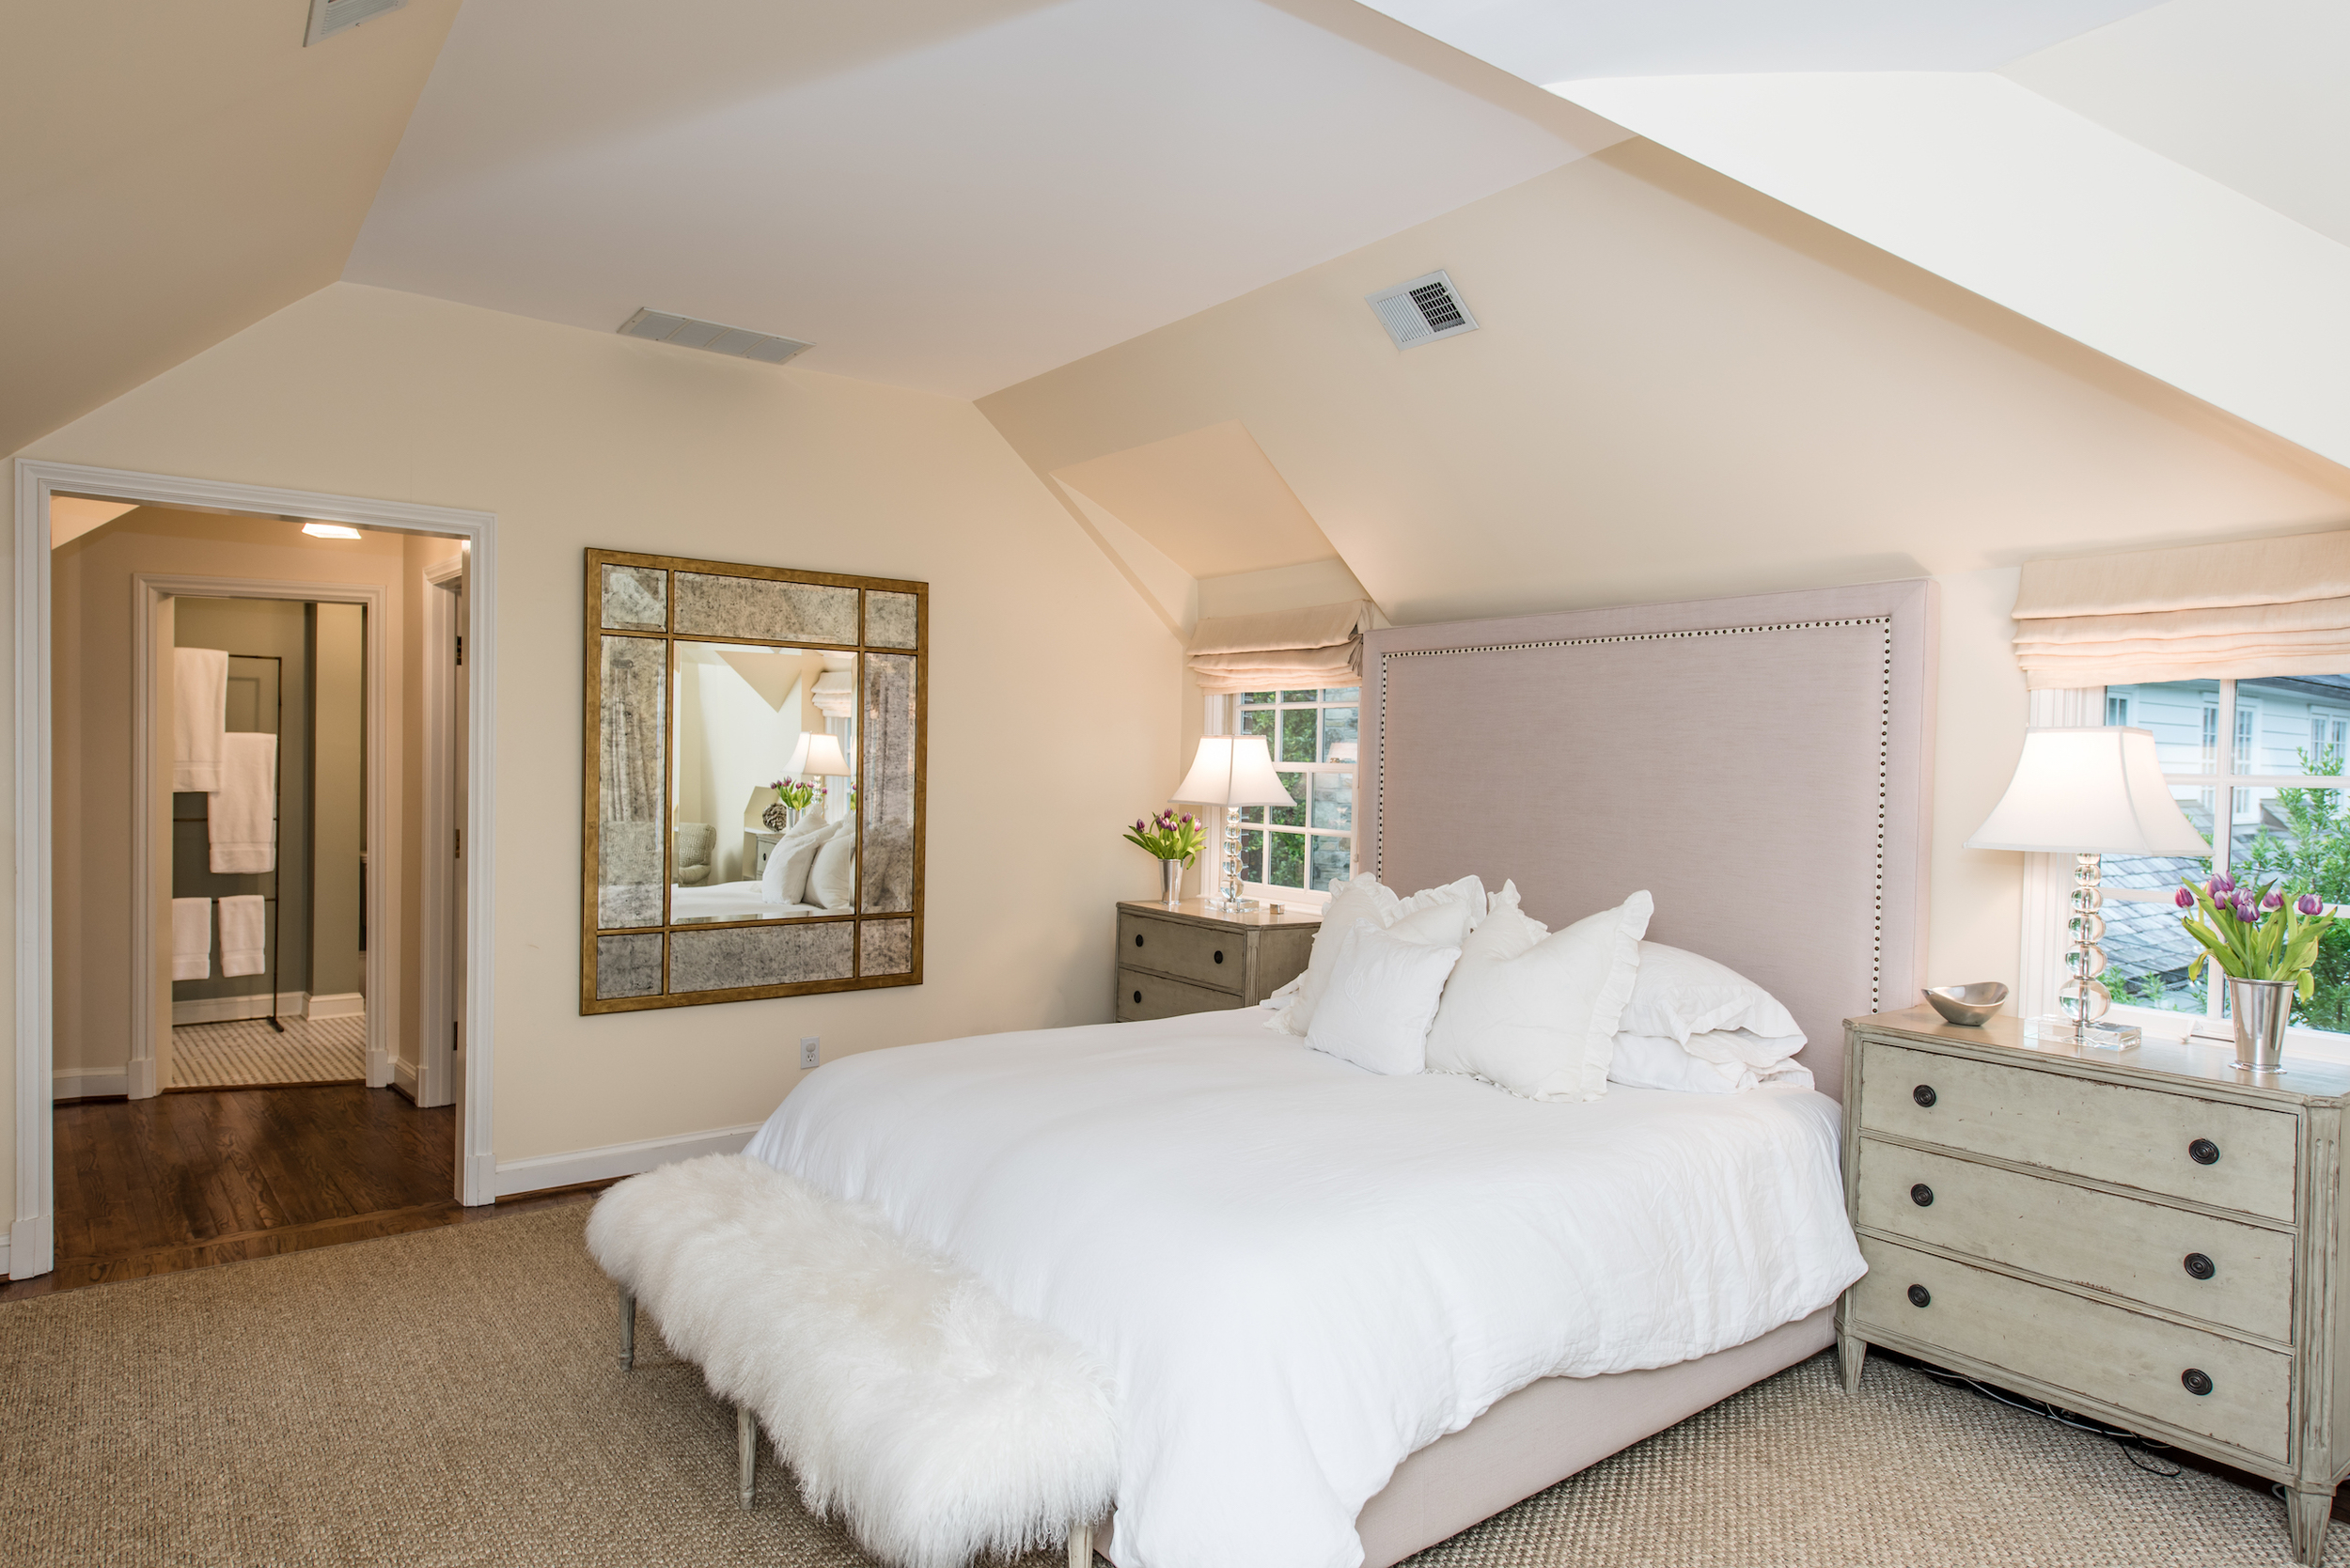 Master Suite with Walk-in Closet